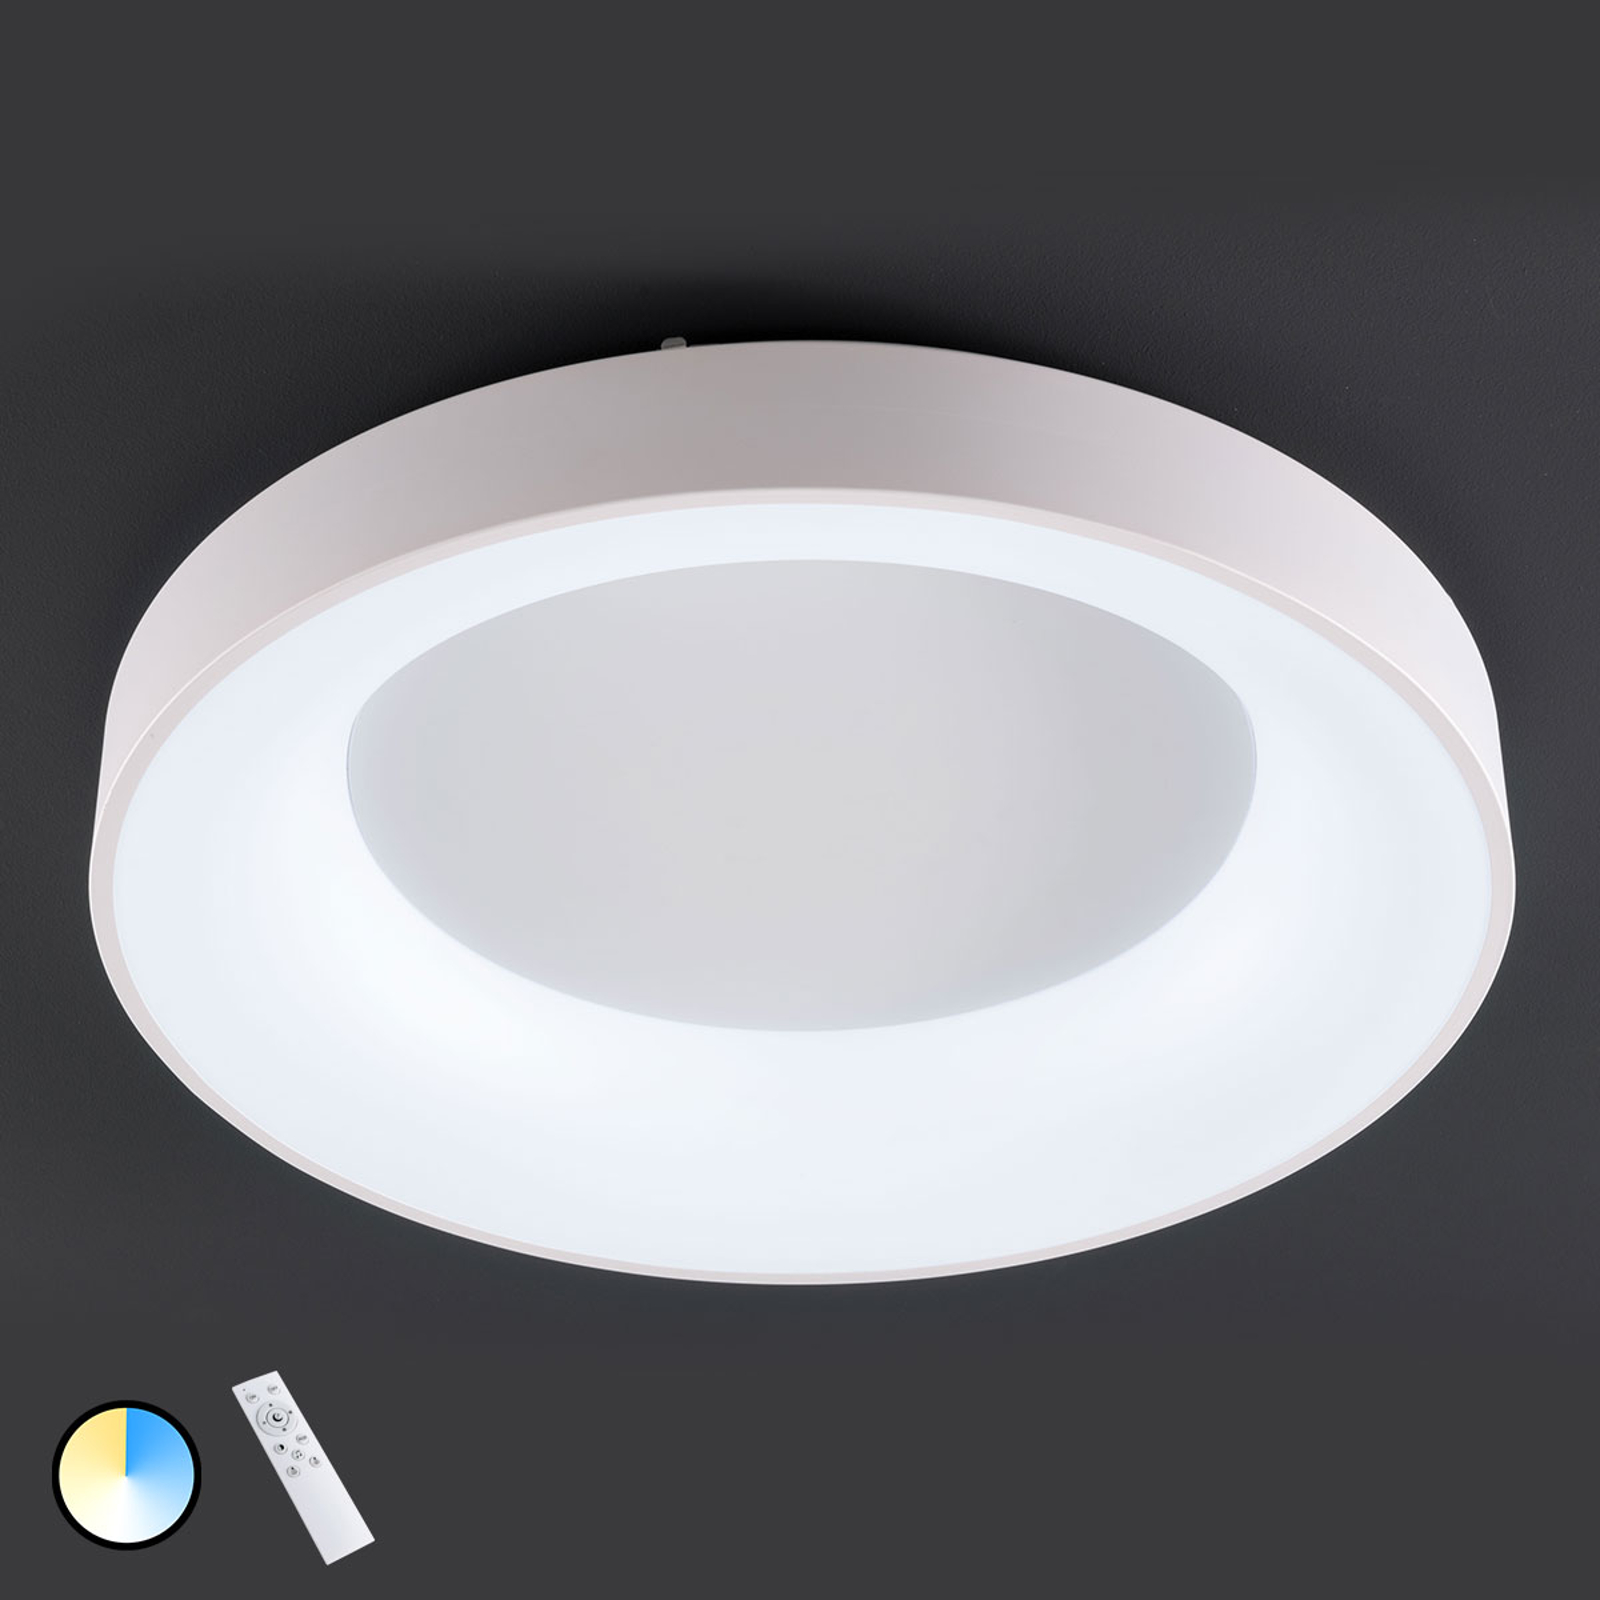 LED-plafondlamp Cameron, afstandsbediening, Ø78cm